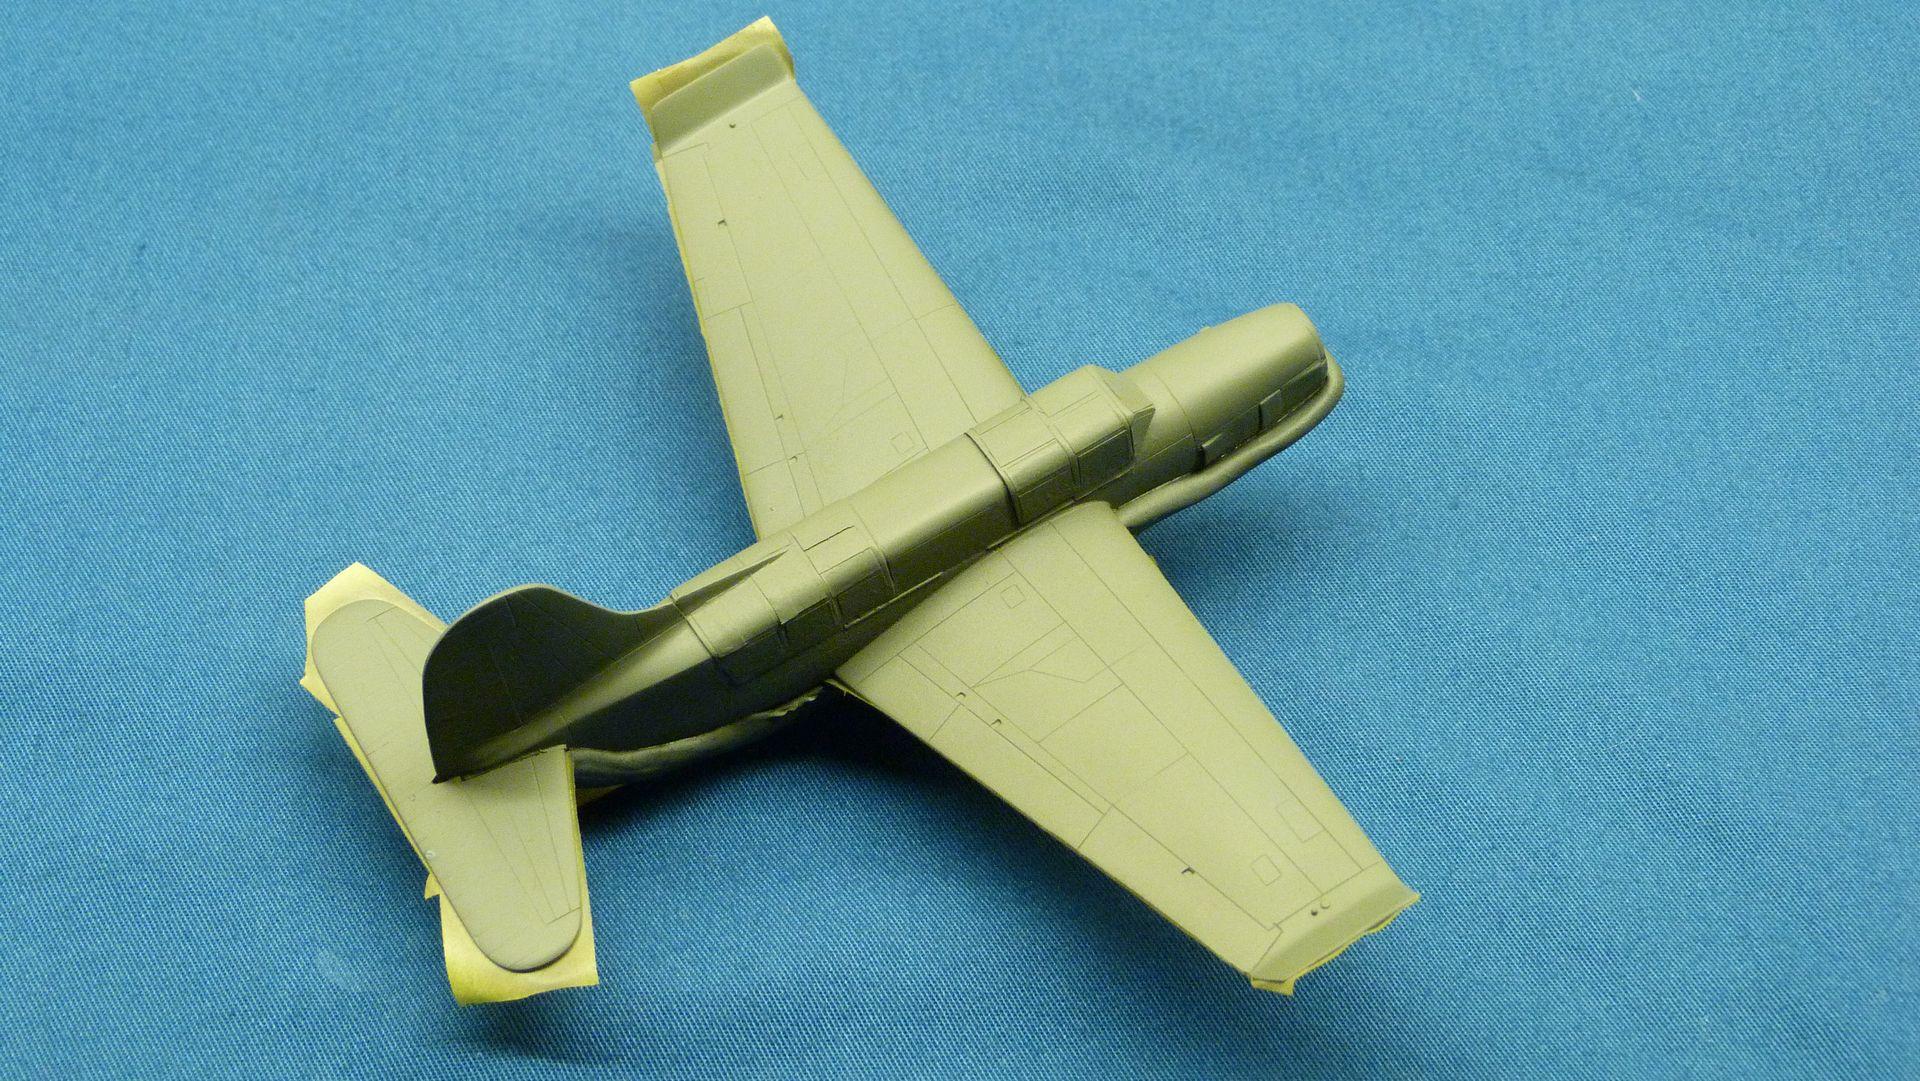 Julklappsbygge: Curtiss Seamew Mk1, Sword 1/72 - Sida 3 47327182752_338ba78d94_o